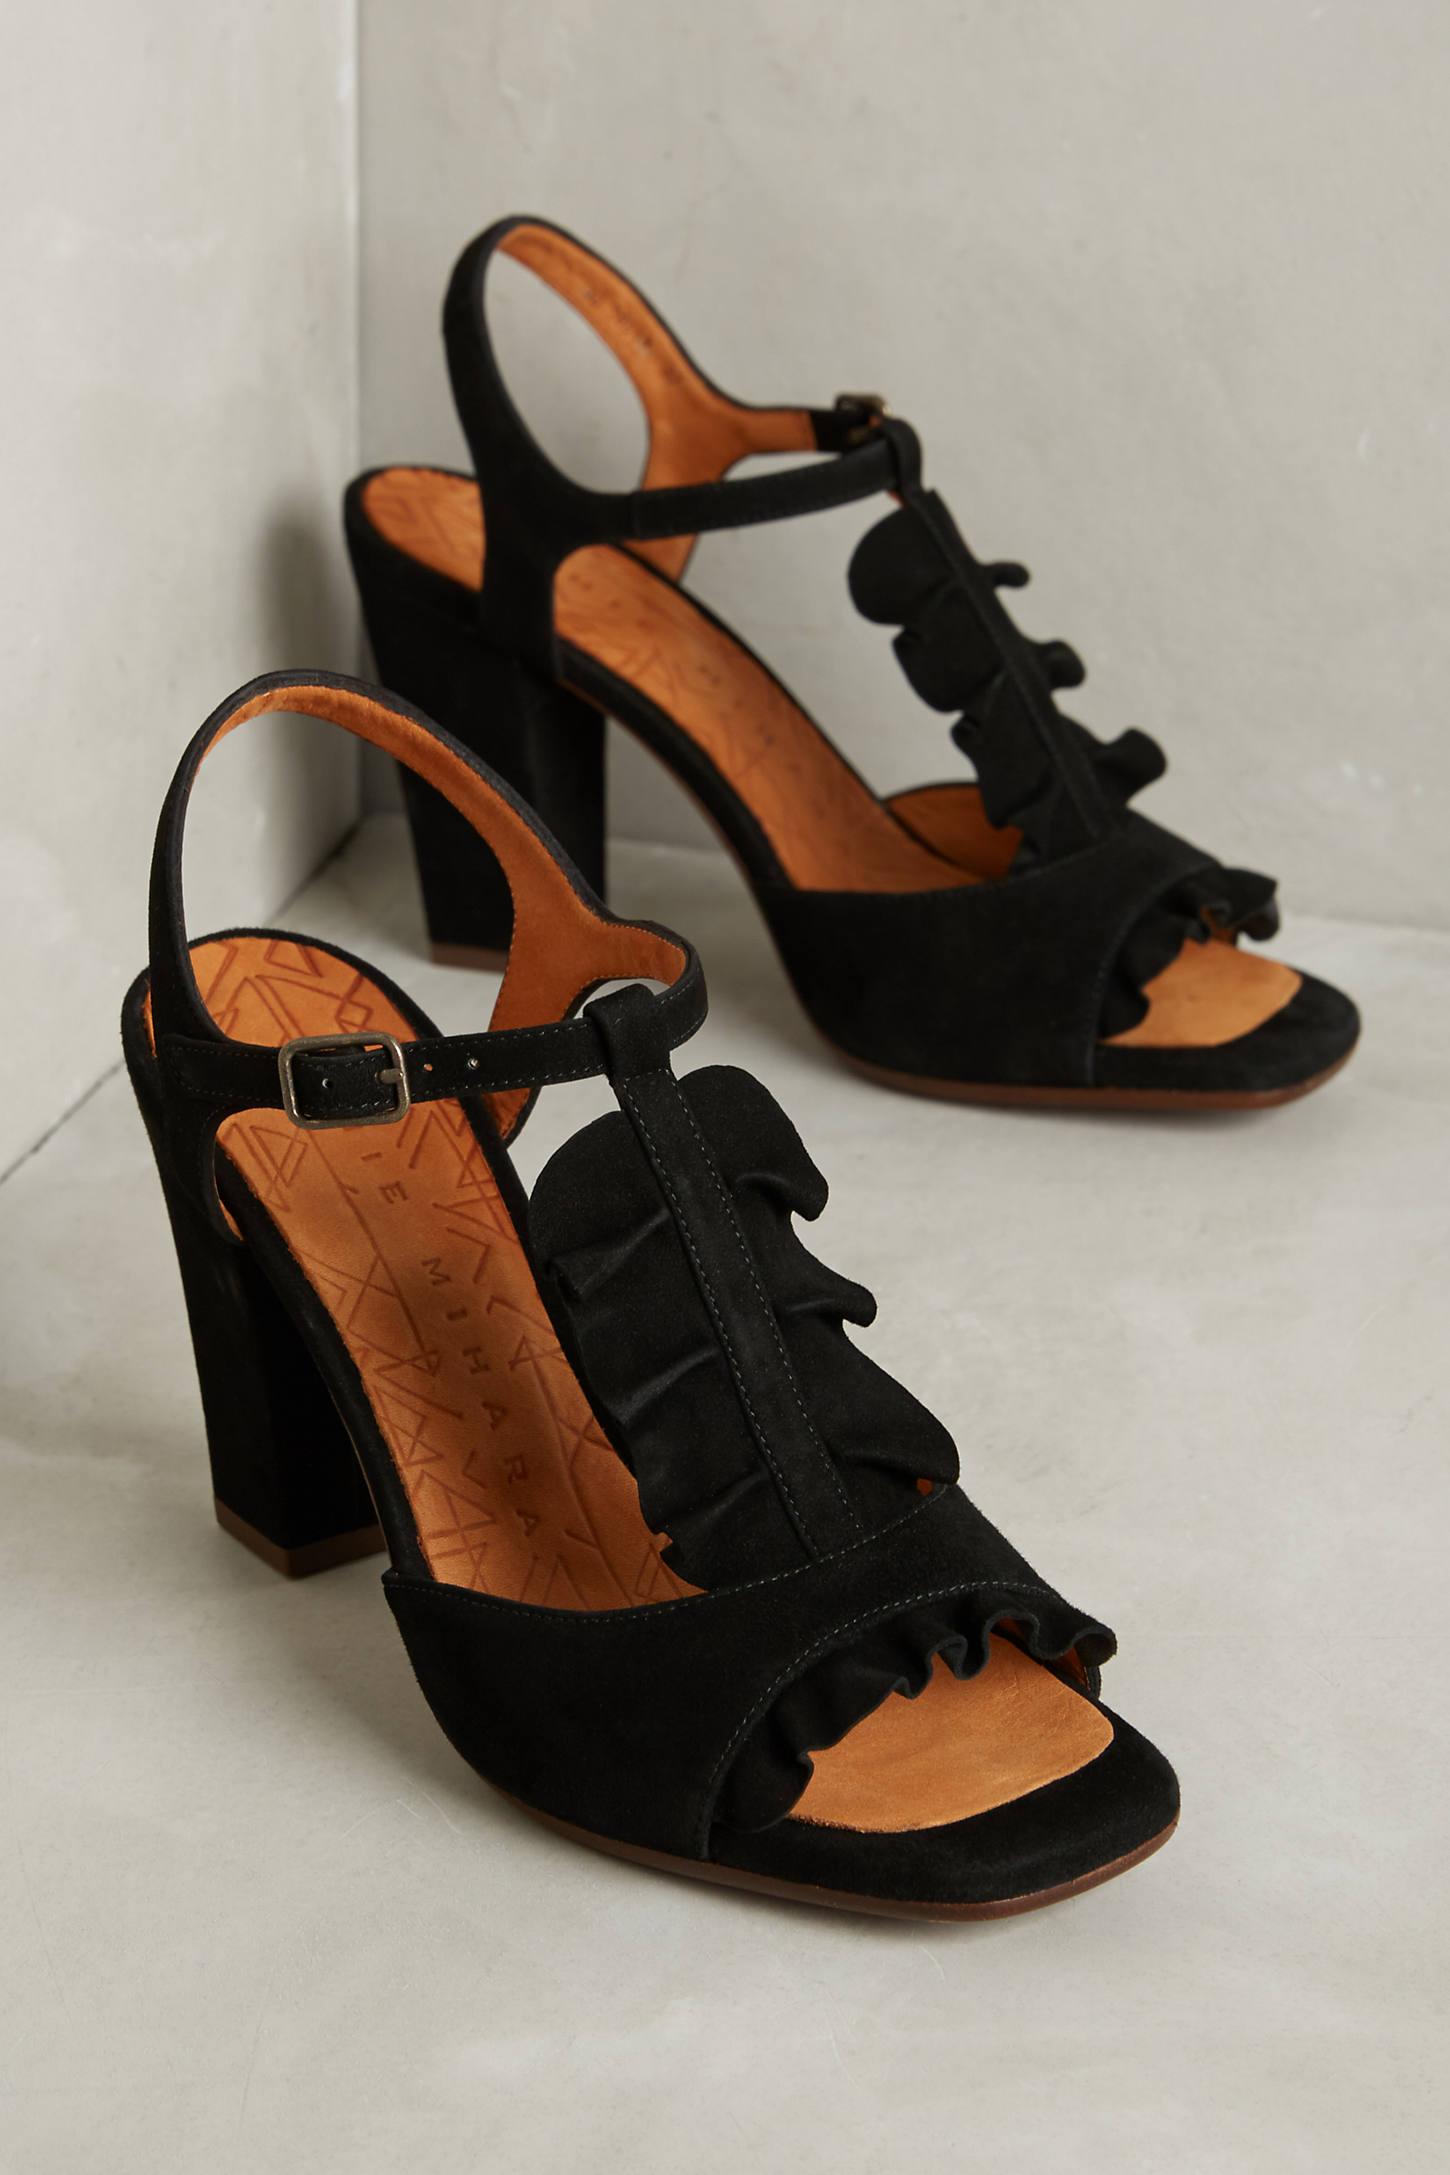 Chie Mihara Ruffled T-Strap Heels